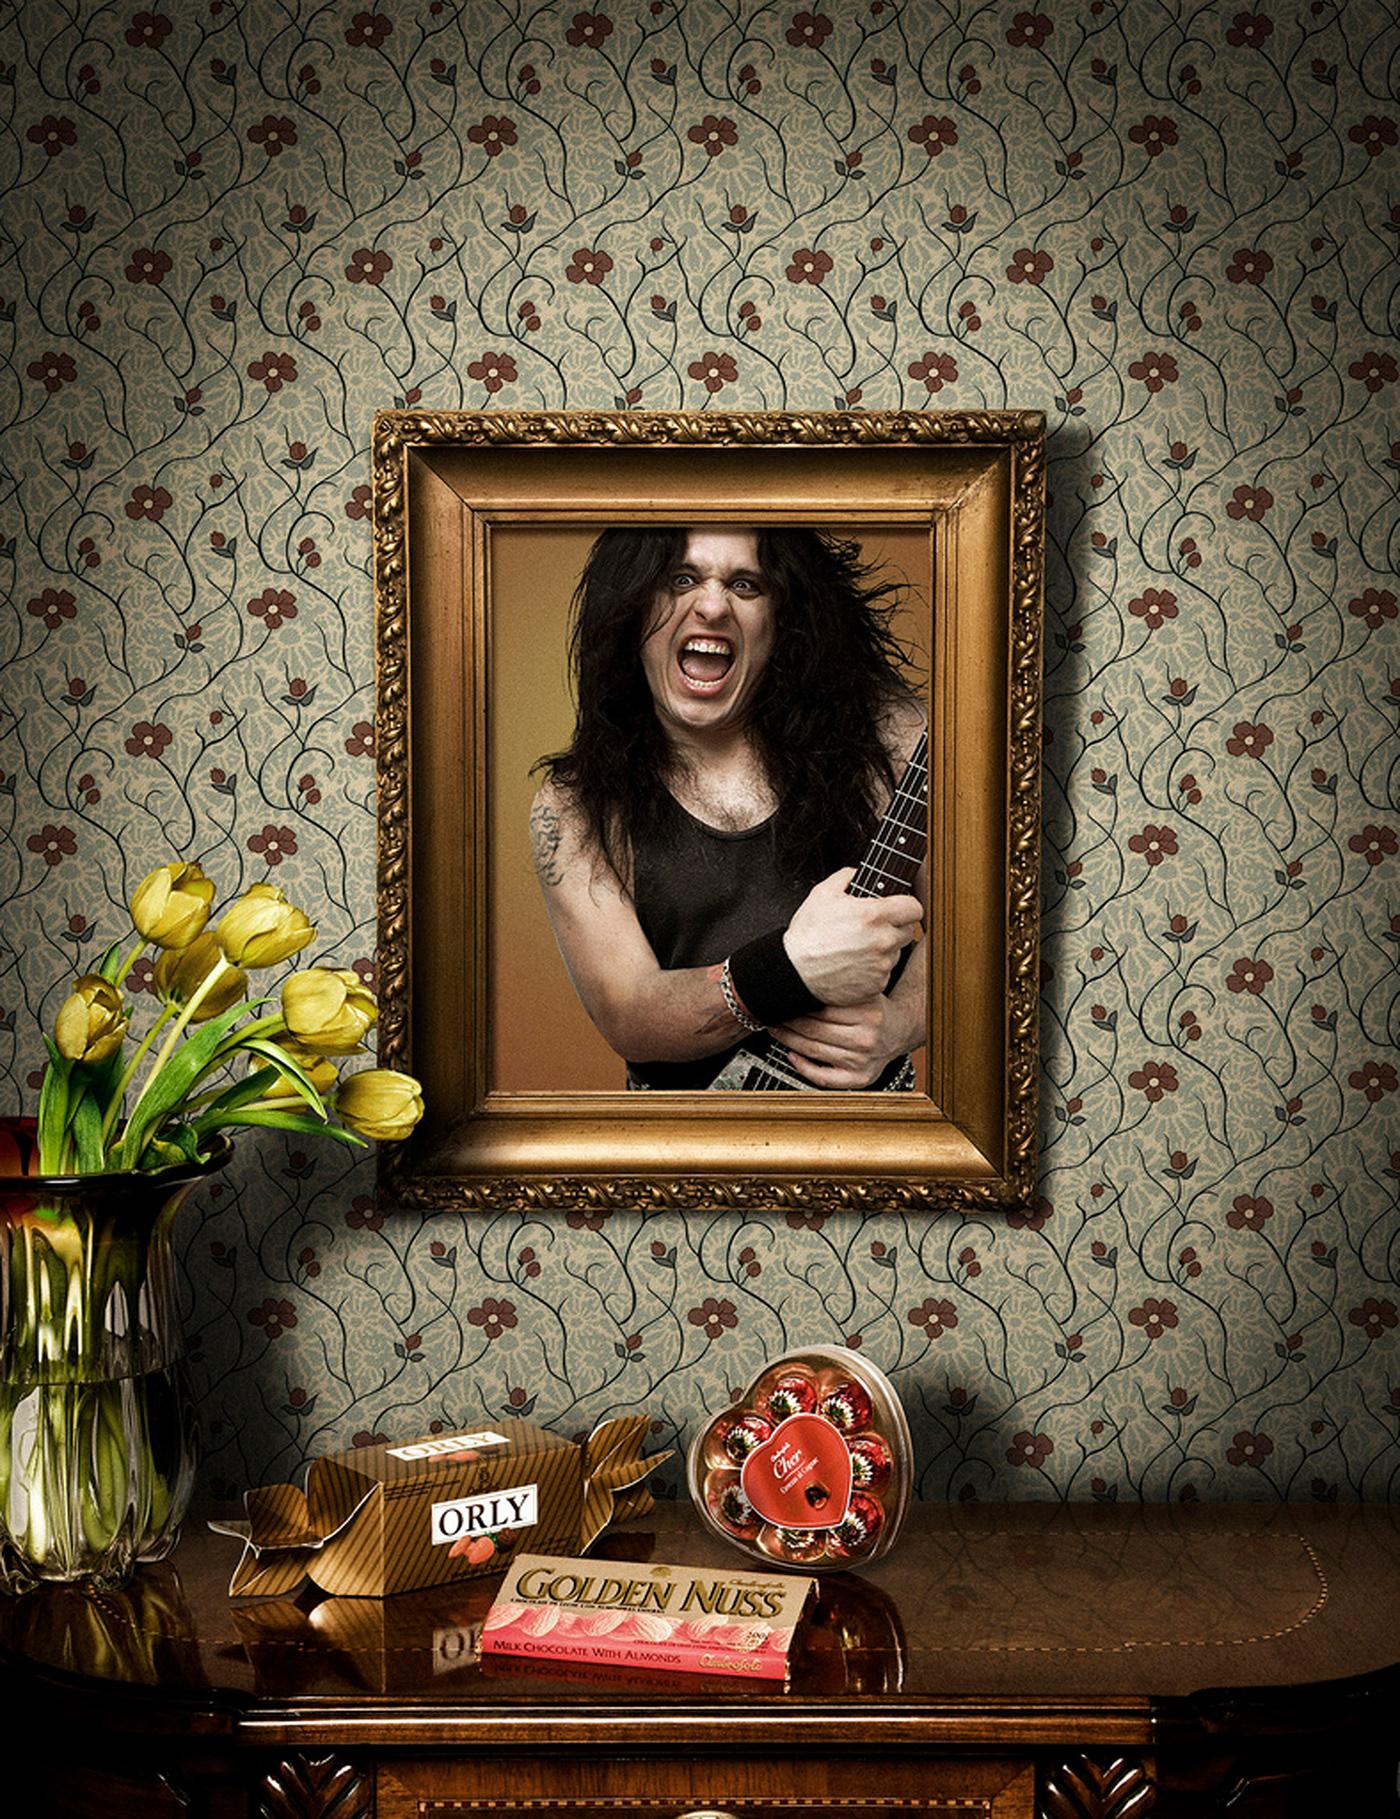 chocolate dia de la madre ilustracion orly photoshop rock Rocker